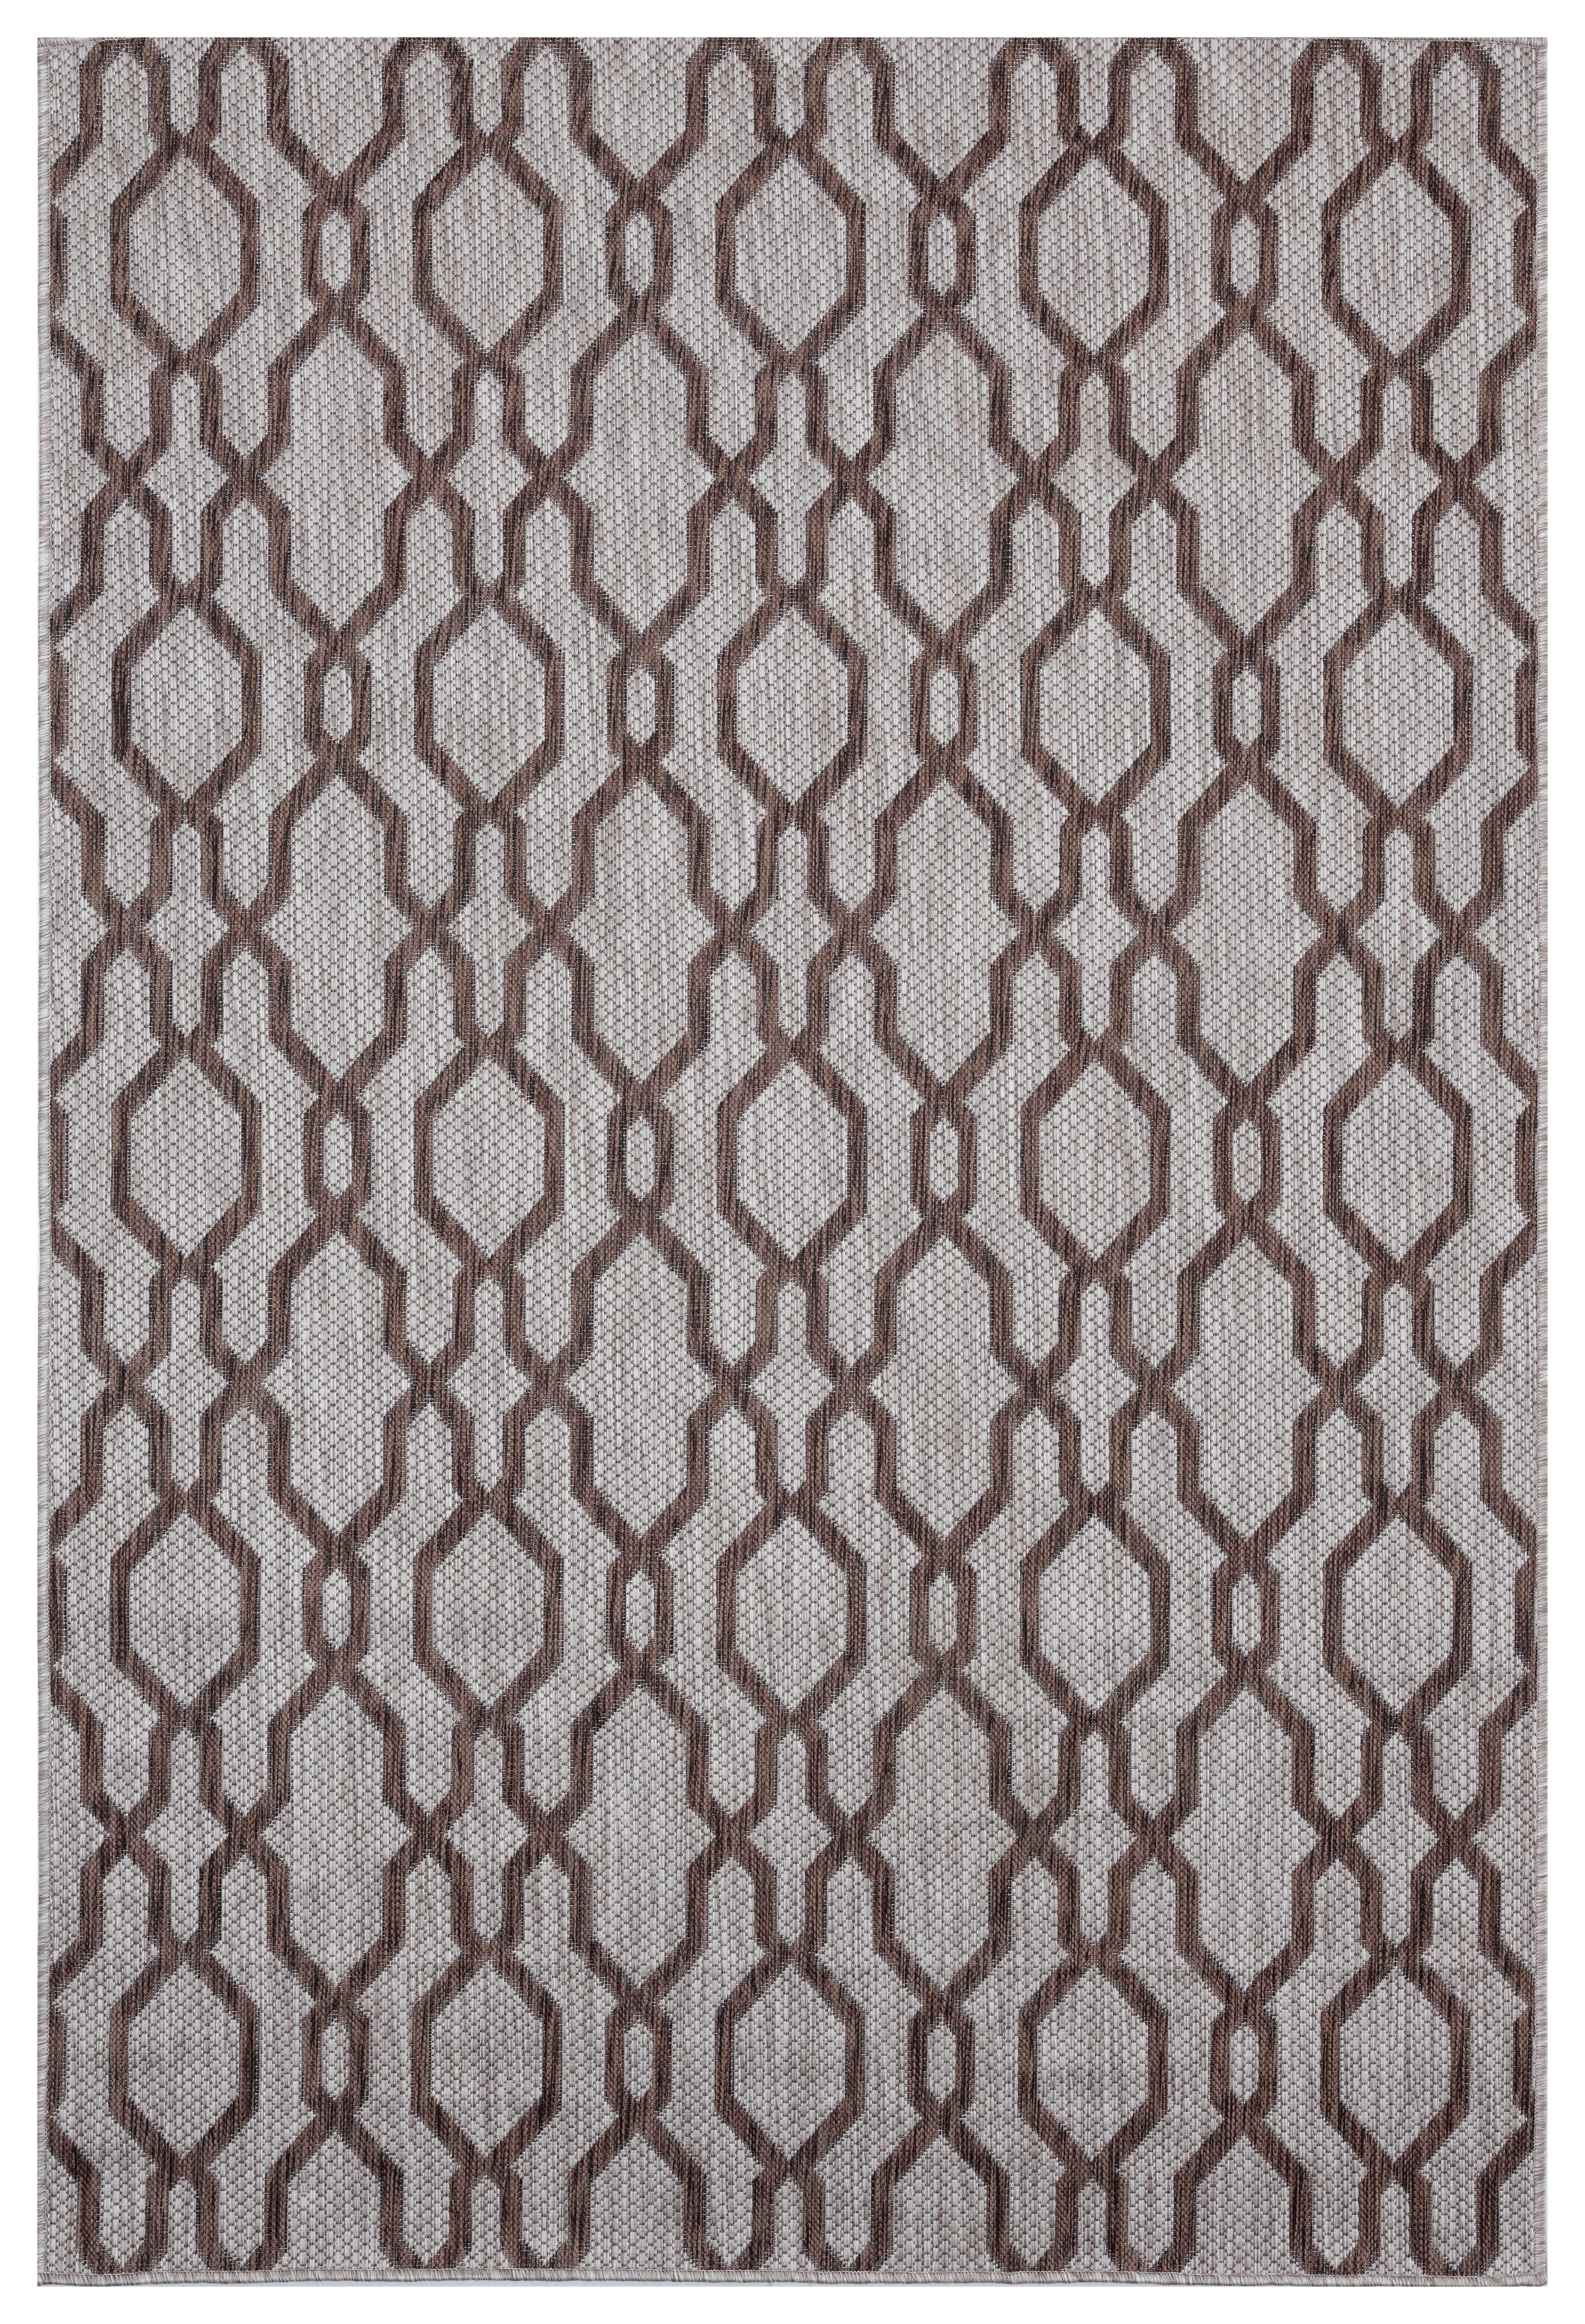 Canora Grey Purkey Geometric Brown Indoor Outdoor Use Area Rug Wayfair